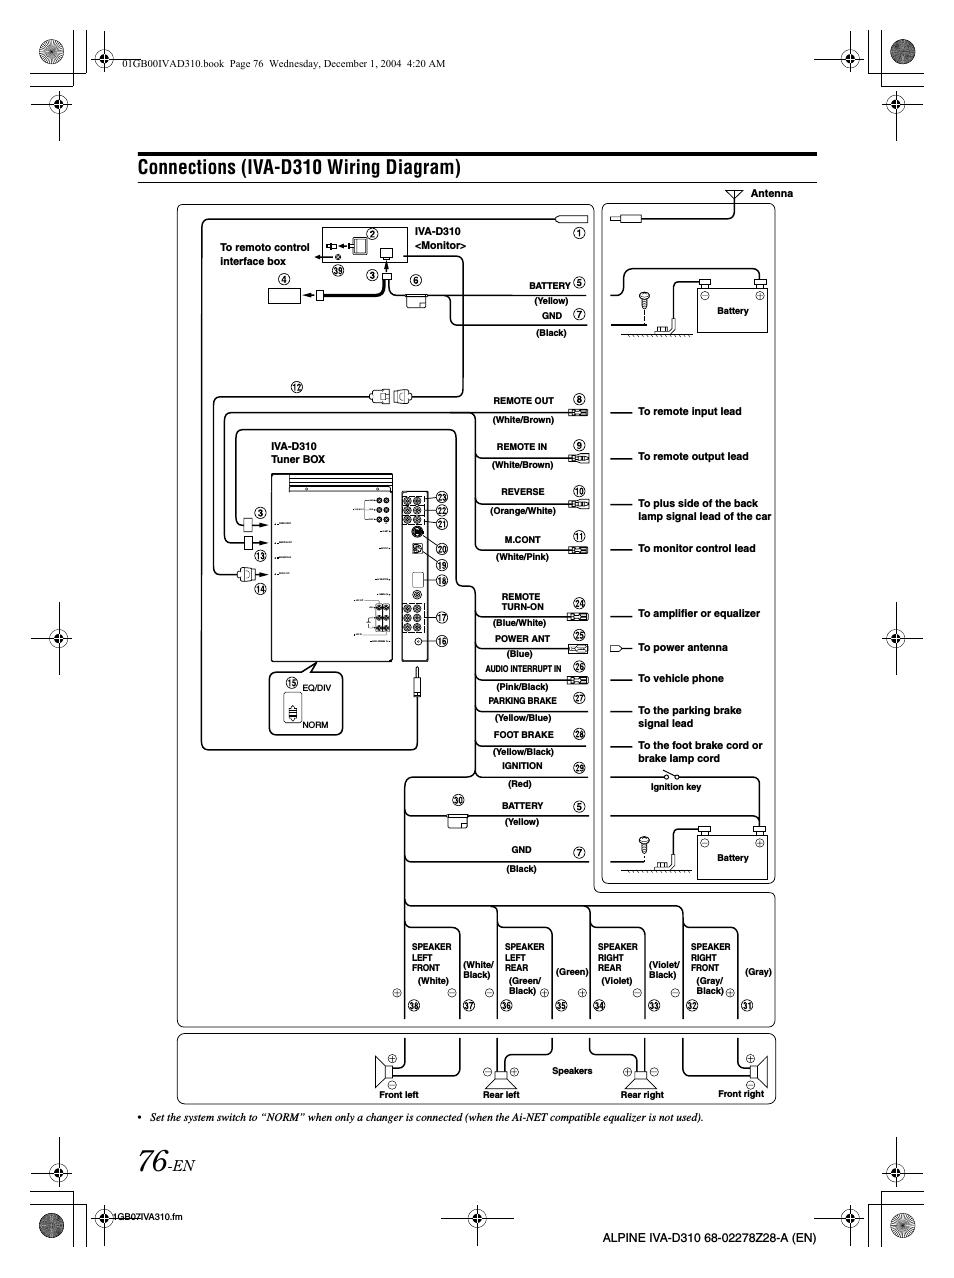 bh_3535] alpine cda 105 wiring diagram download diagram  rally hapolo stre tobiq emba mohammedshrine librar wiring 101